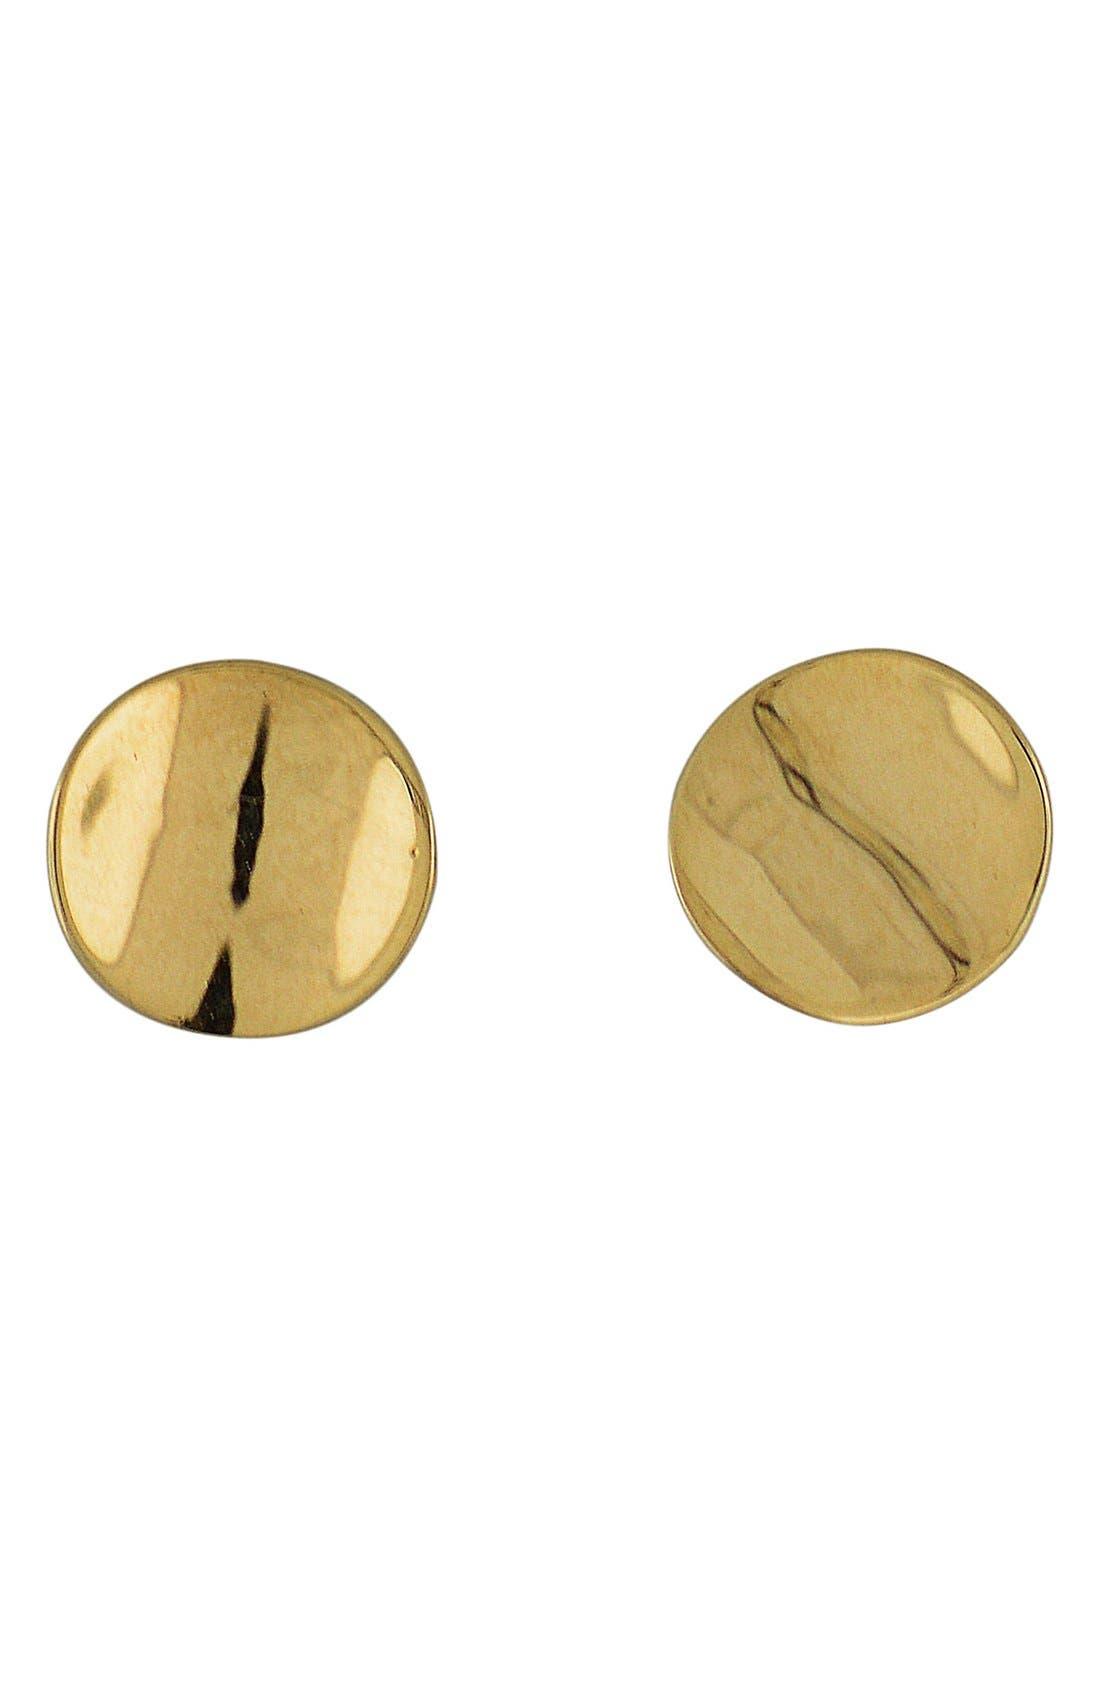 Bony Levey Aurelia Stud Earrings,                             Main thumbnail 1, color,                             YELLOW GOLD